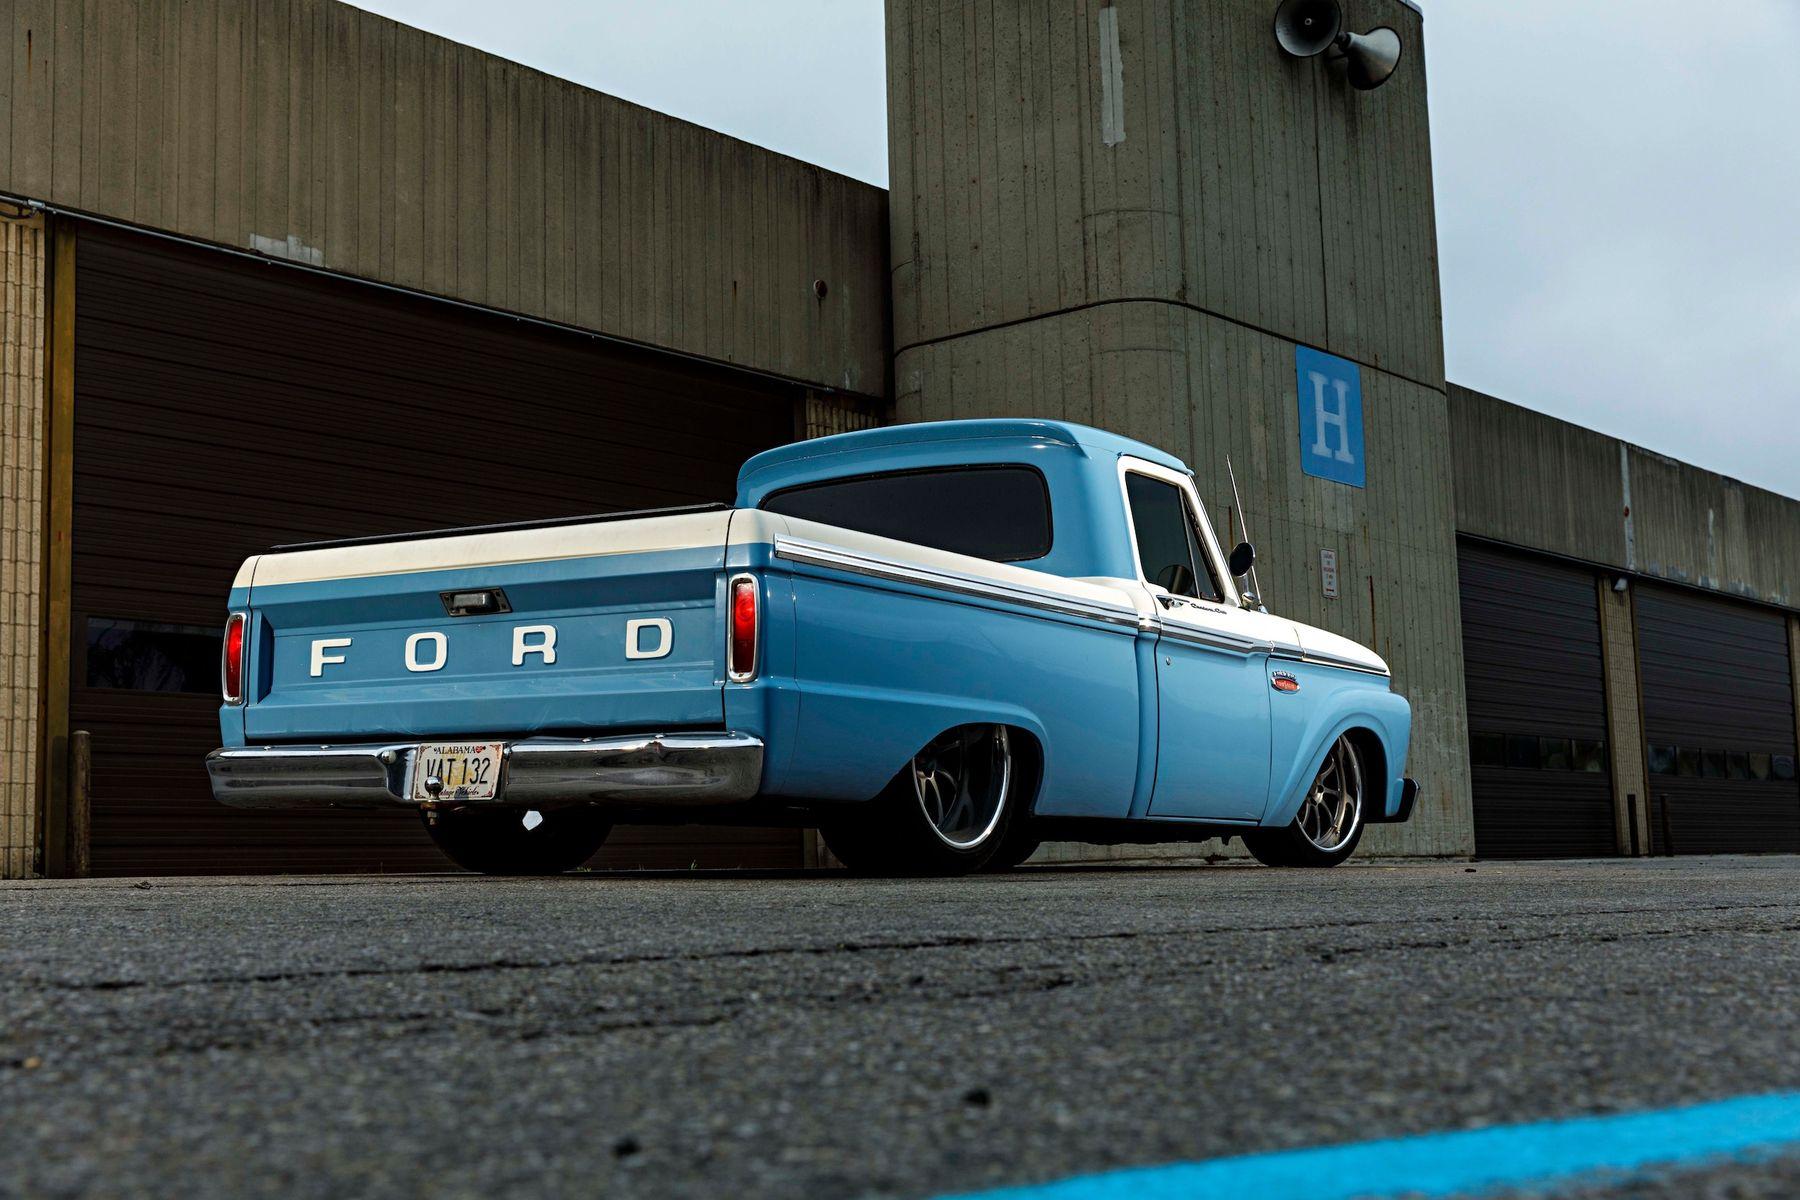 1965 Ford F-150 | Jimmy Butler's Big Oak Garage Ford F-100 on Forgeline ZX3P Wheels